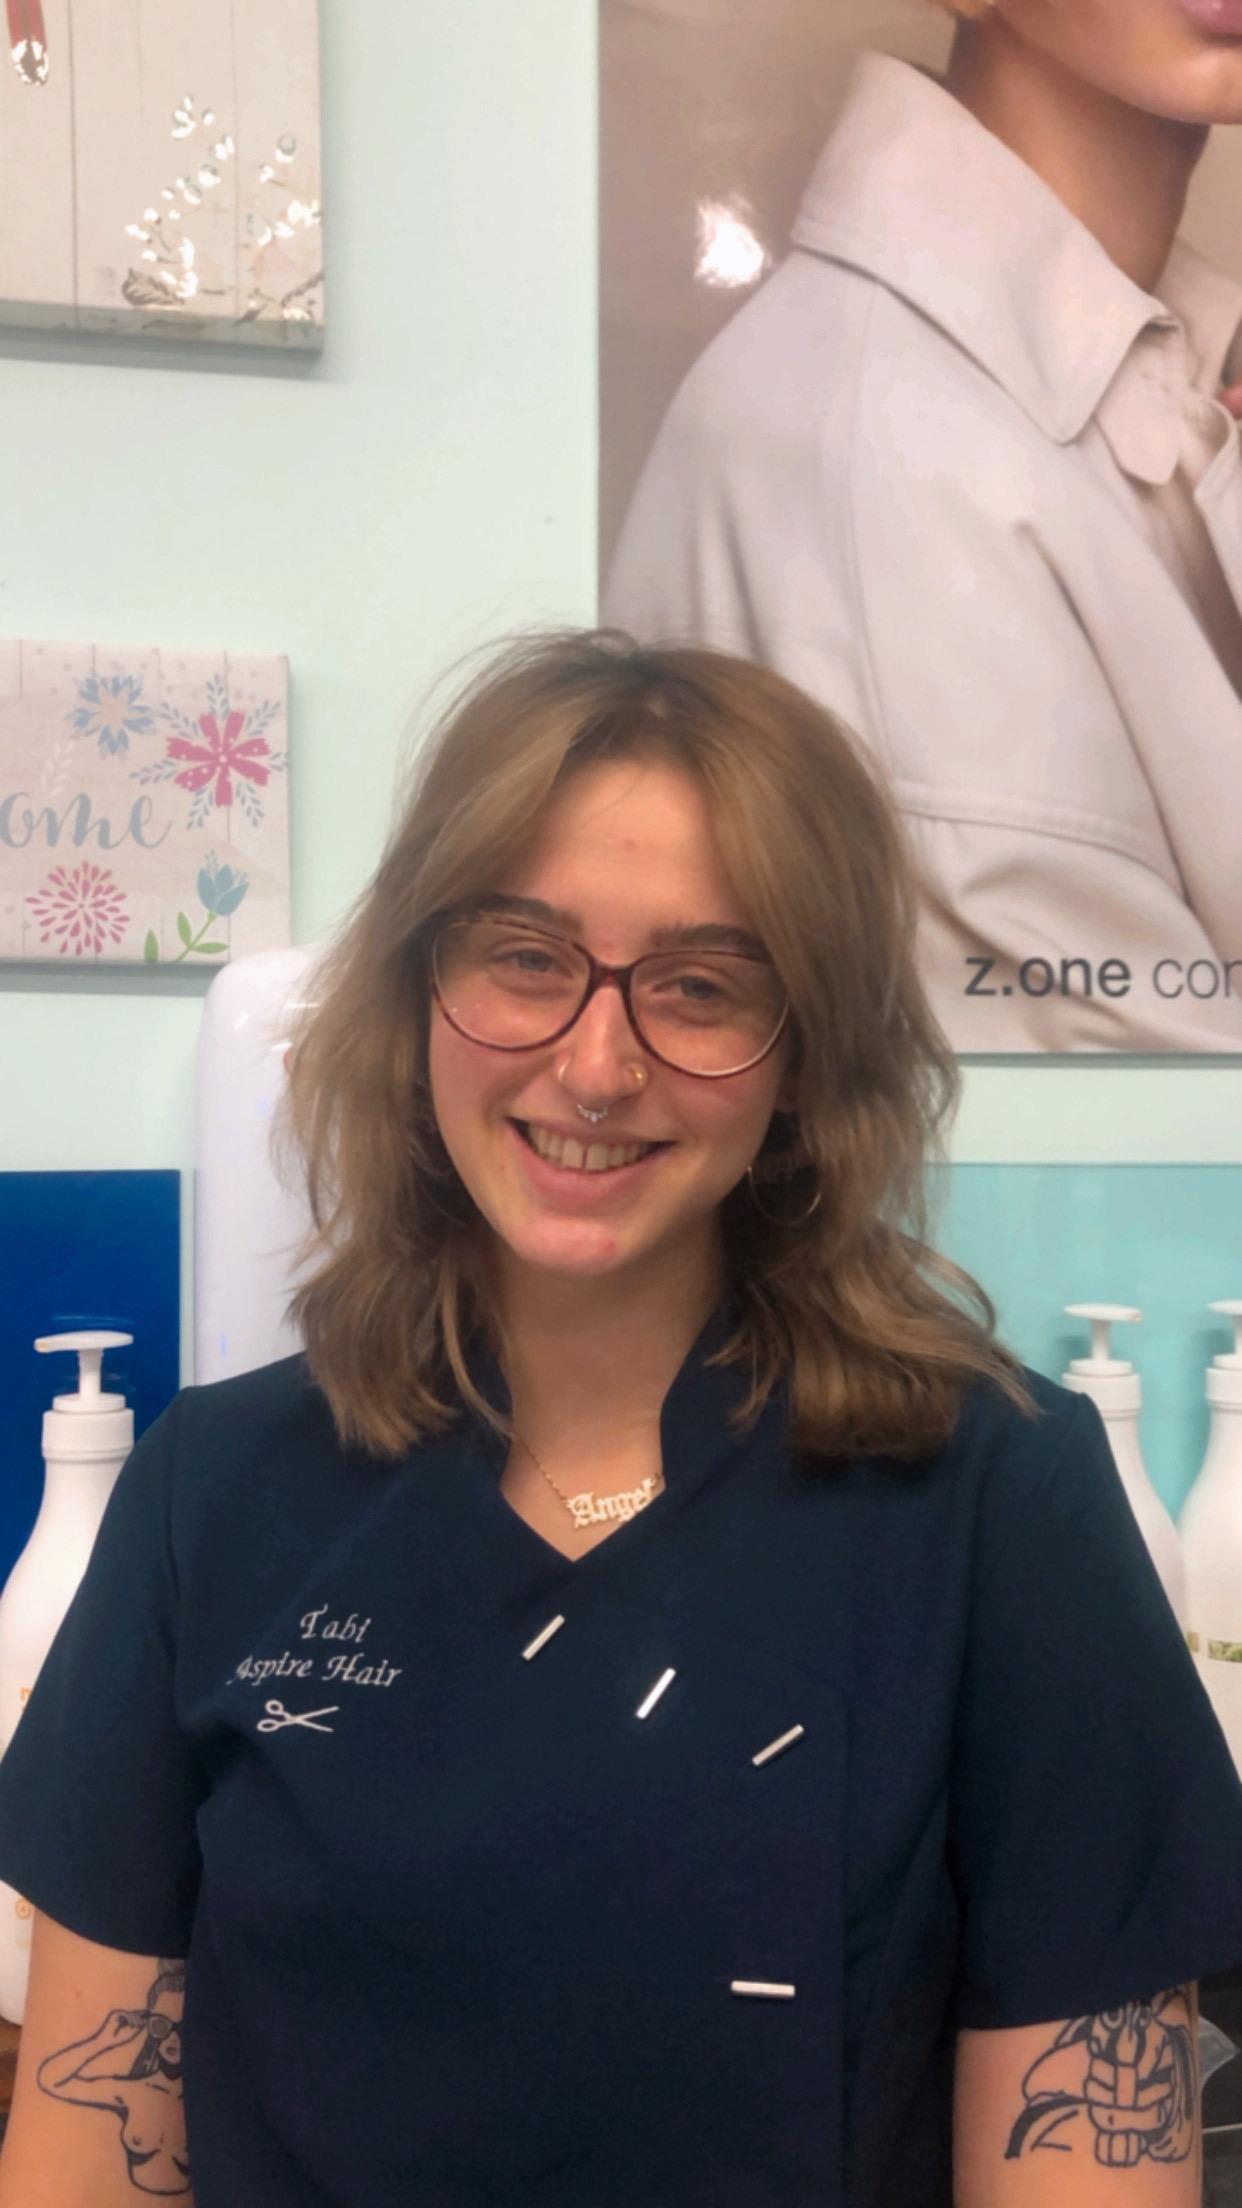 Tabi - aspire hair salon staff